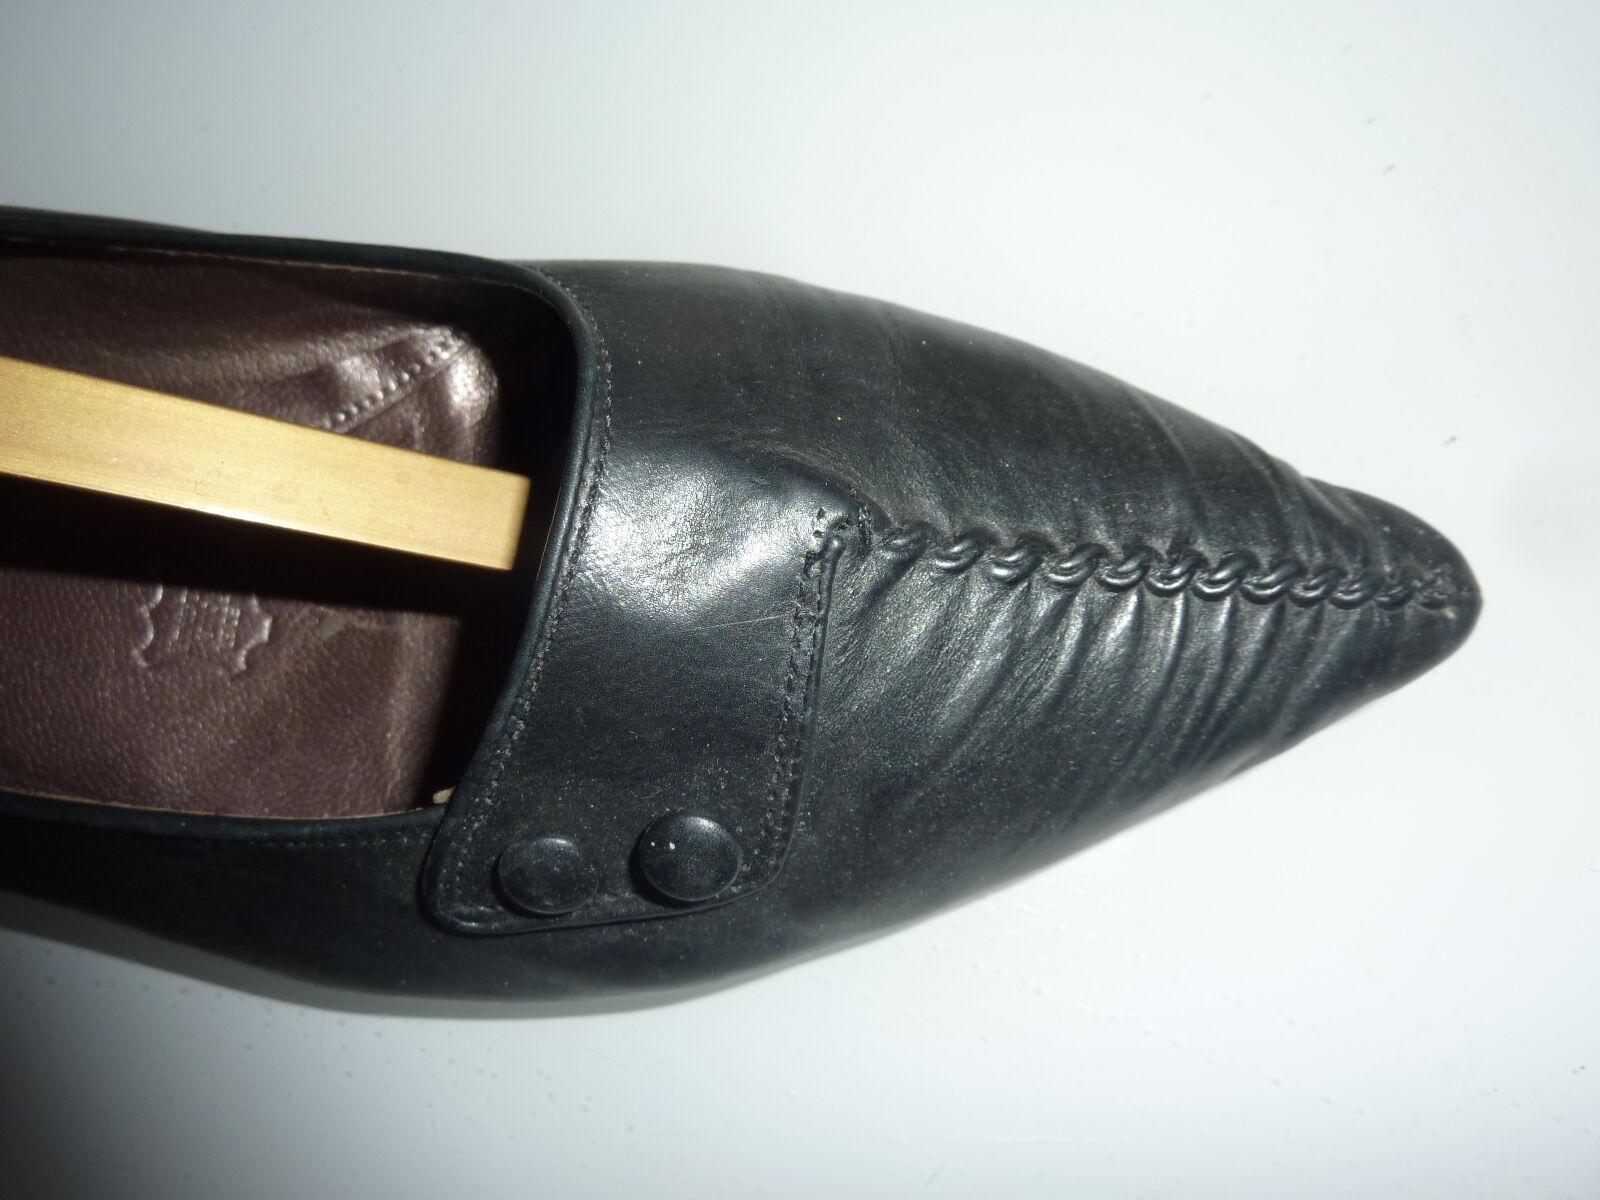 Schuhe wie NEU GR. 41 42 8 GABOR schwarz Leder Damenschuhe Balerina NEU